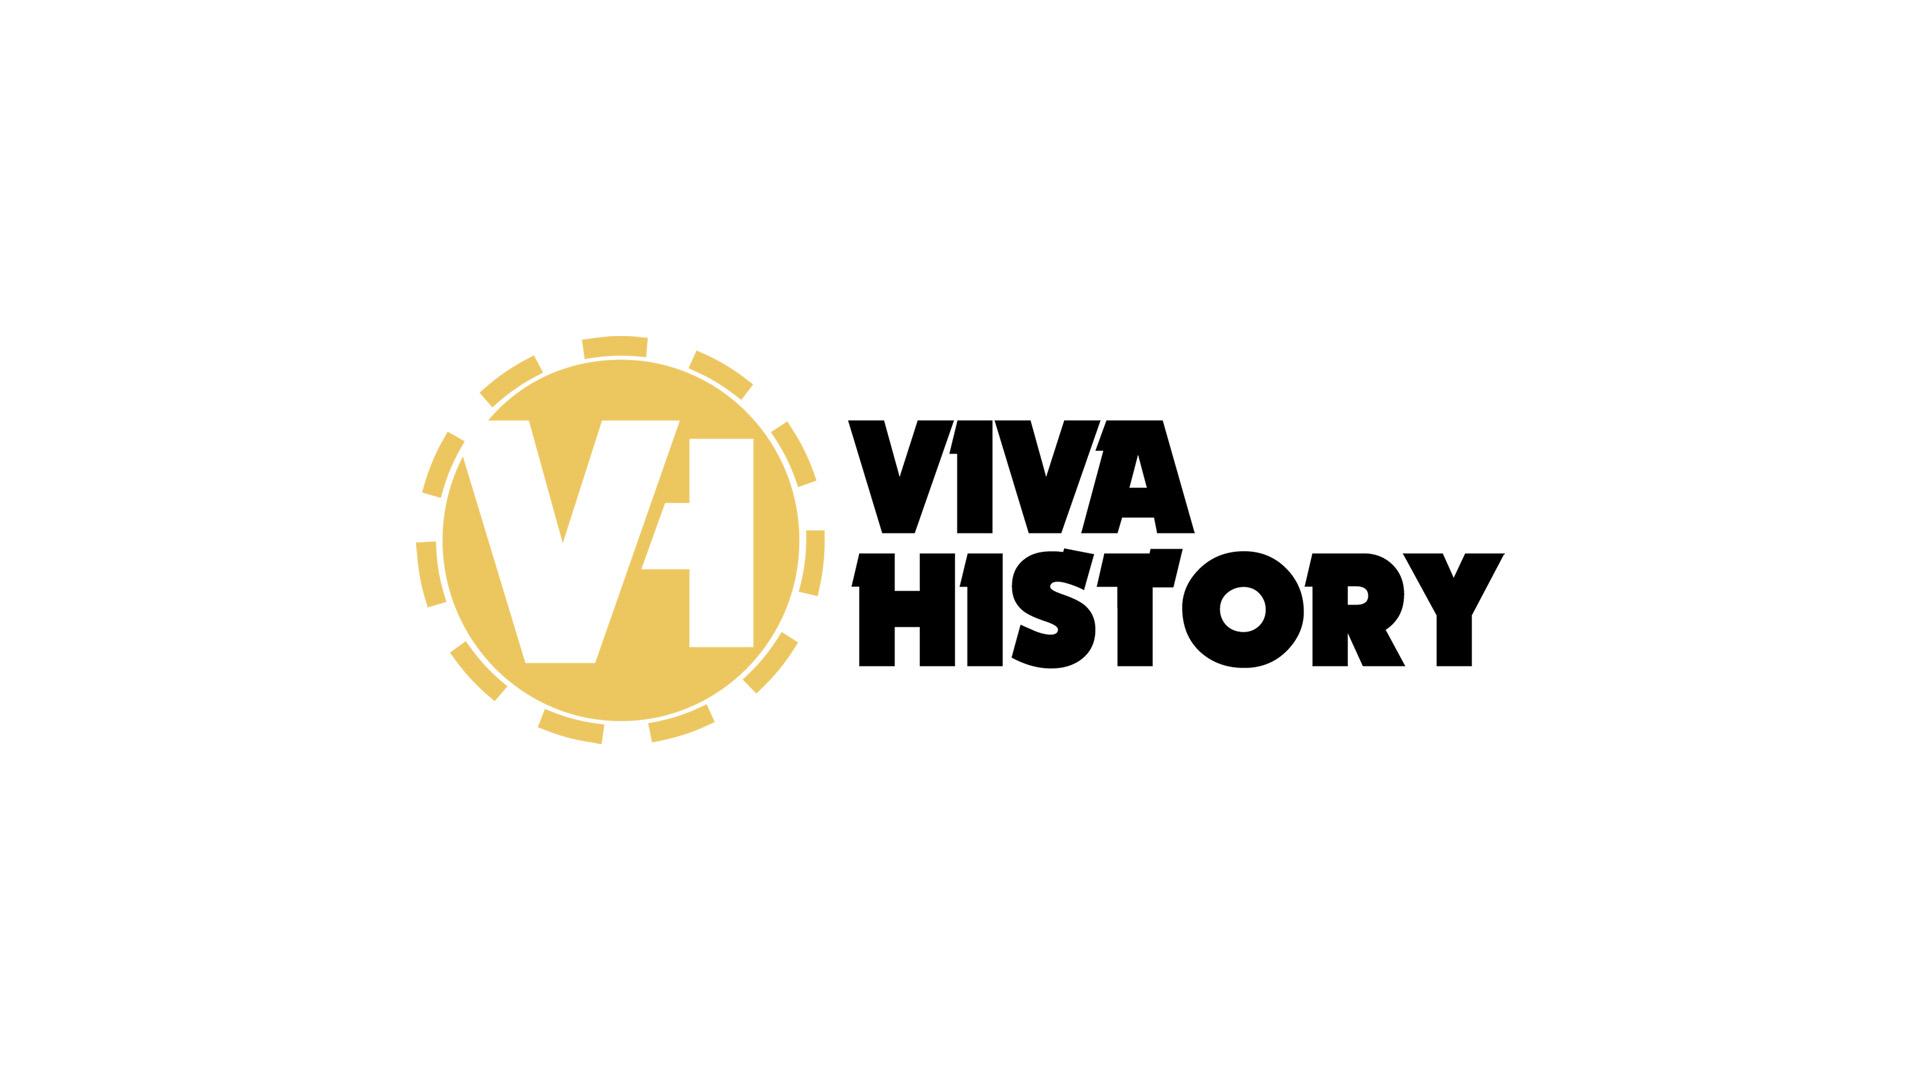 Viva History